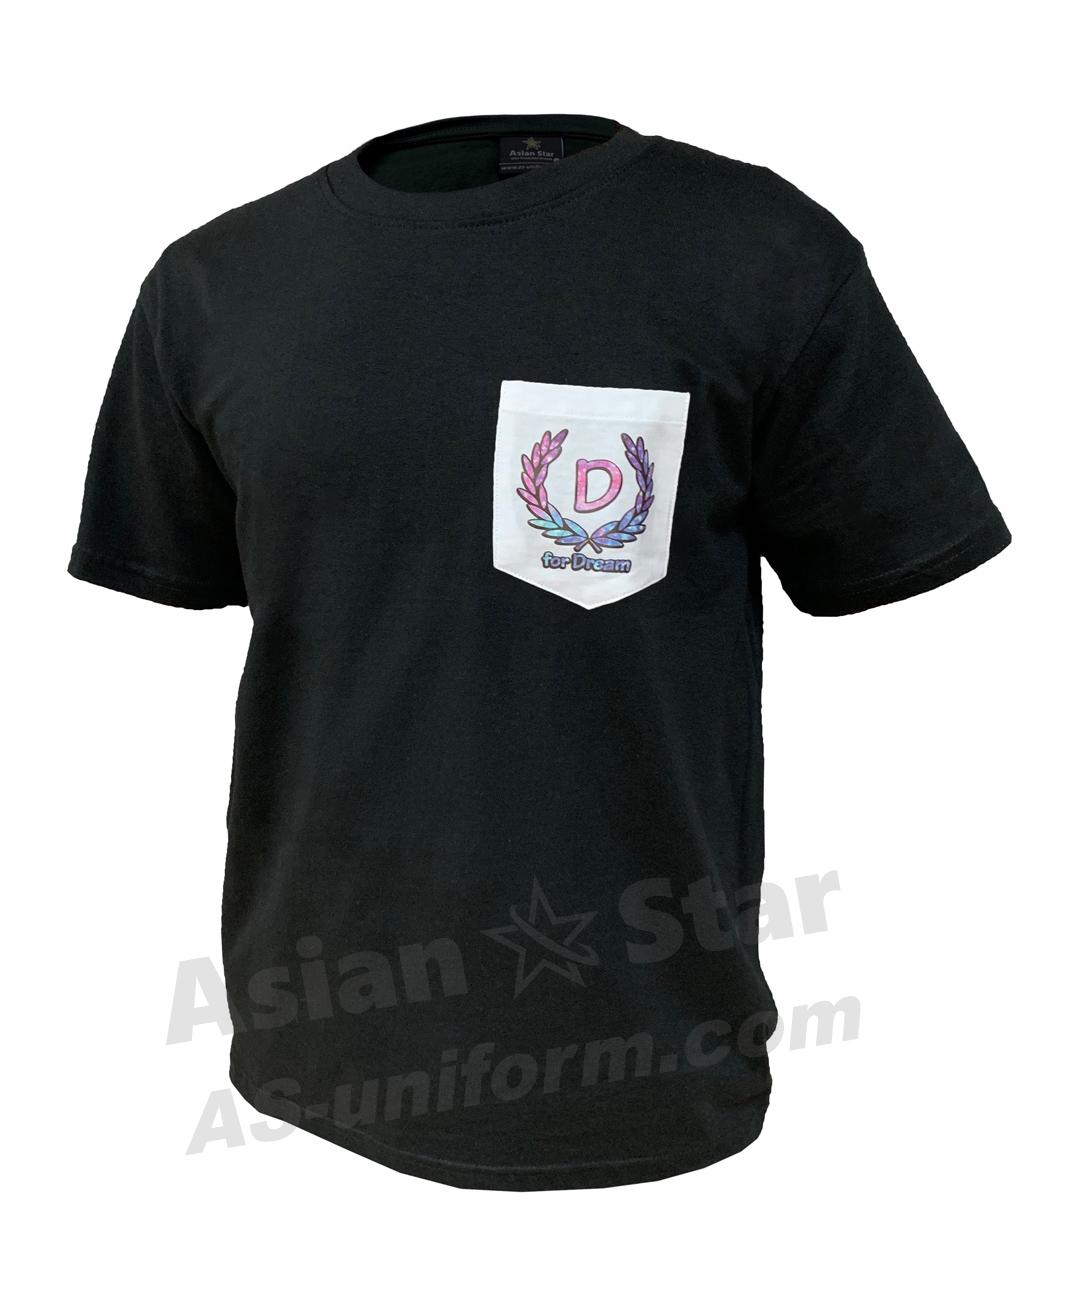 pocket tee 胸袋T恤印製